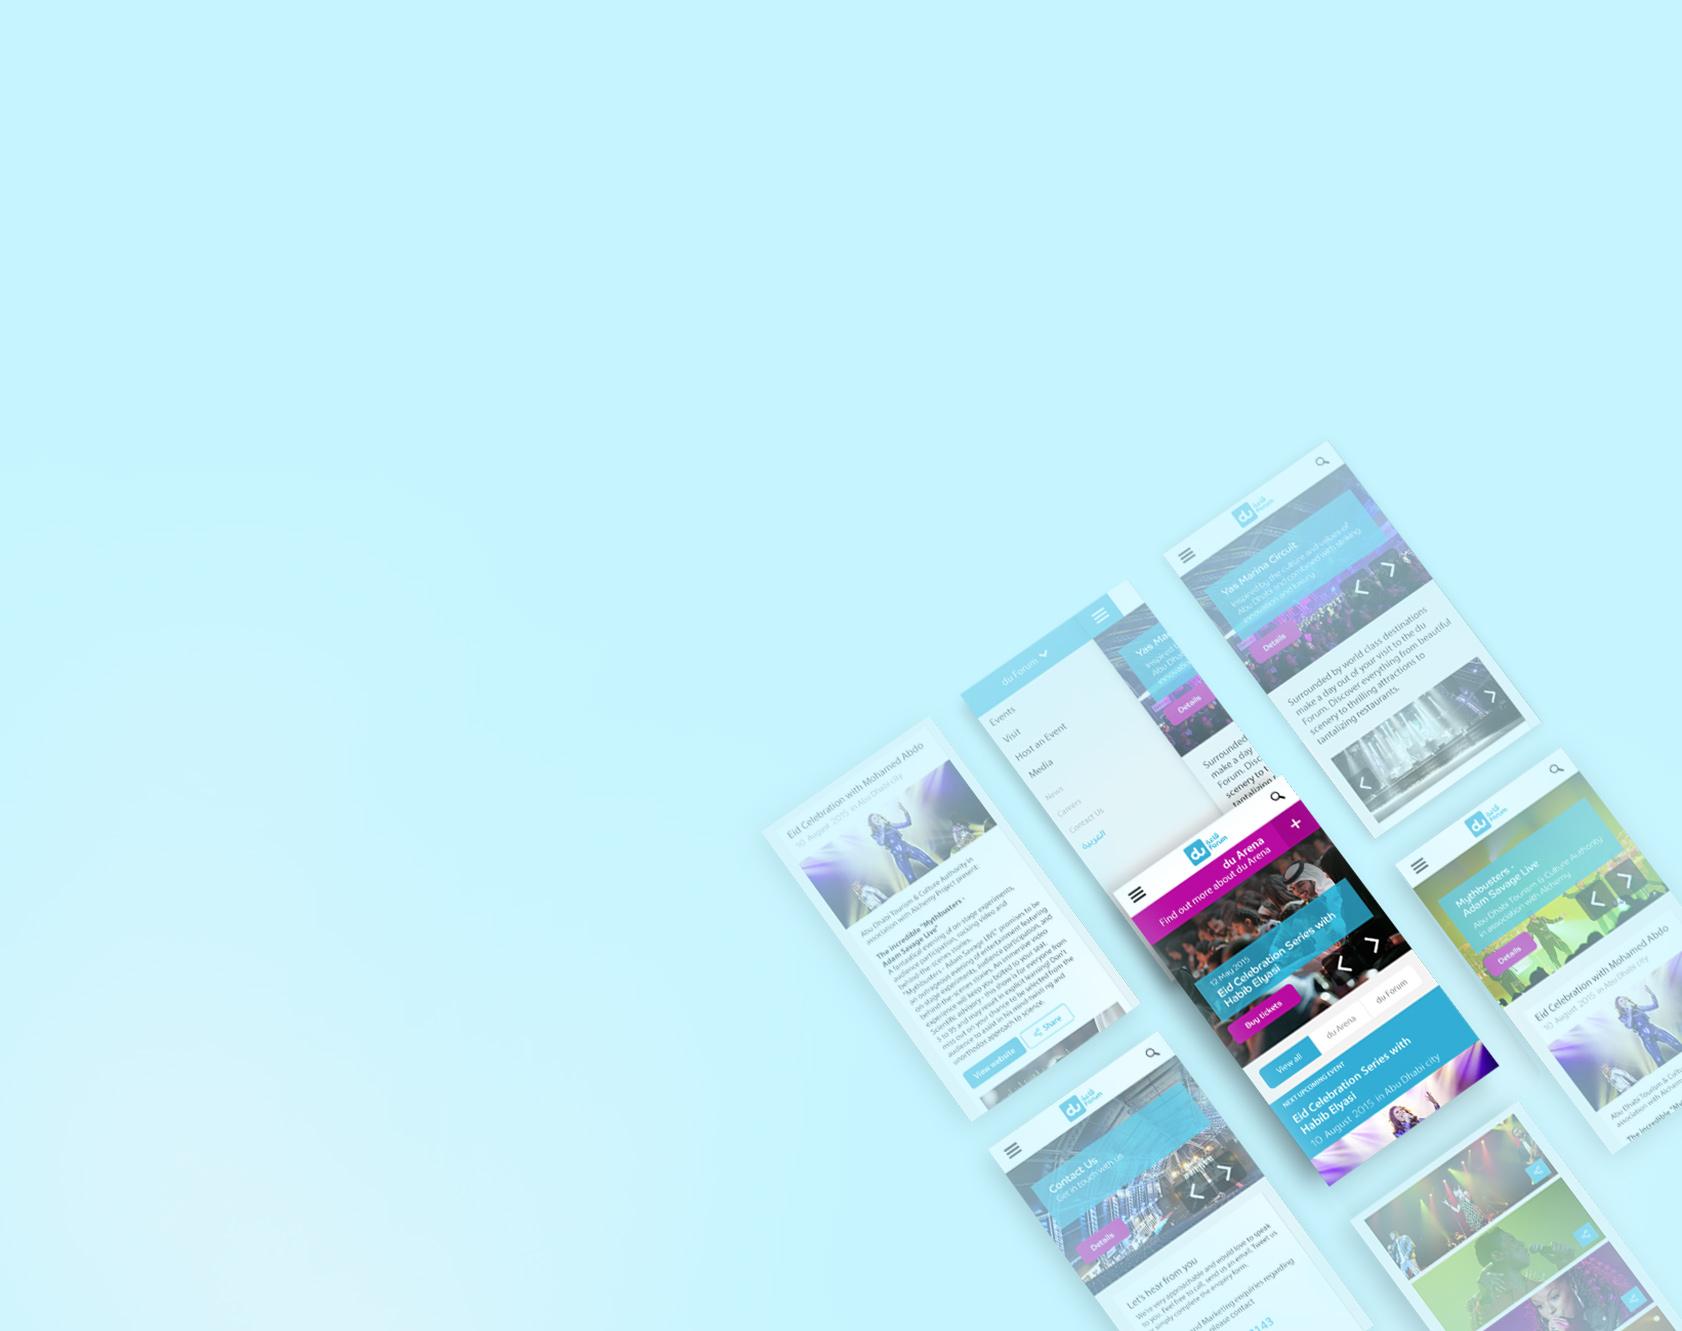 du forum & dur arena website design results